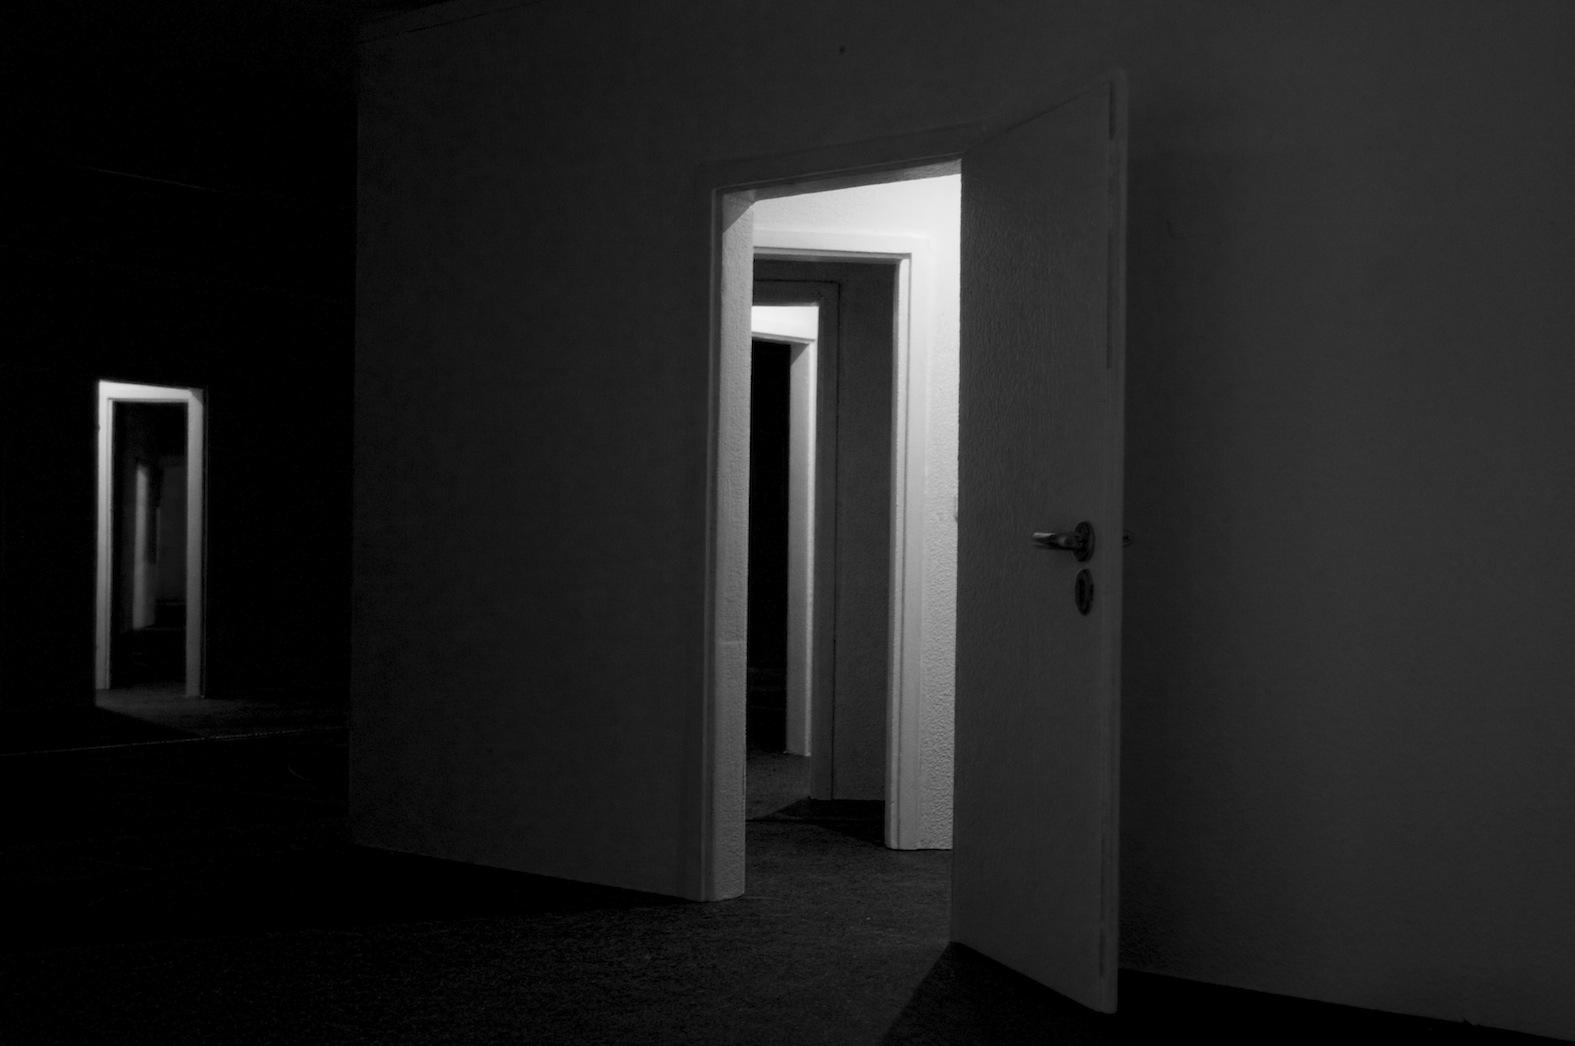 Bernd Oppl Delay Room